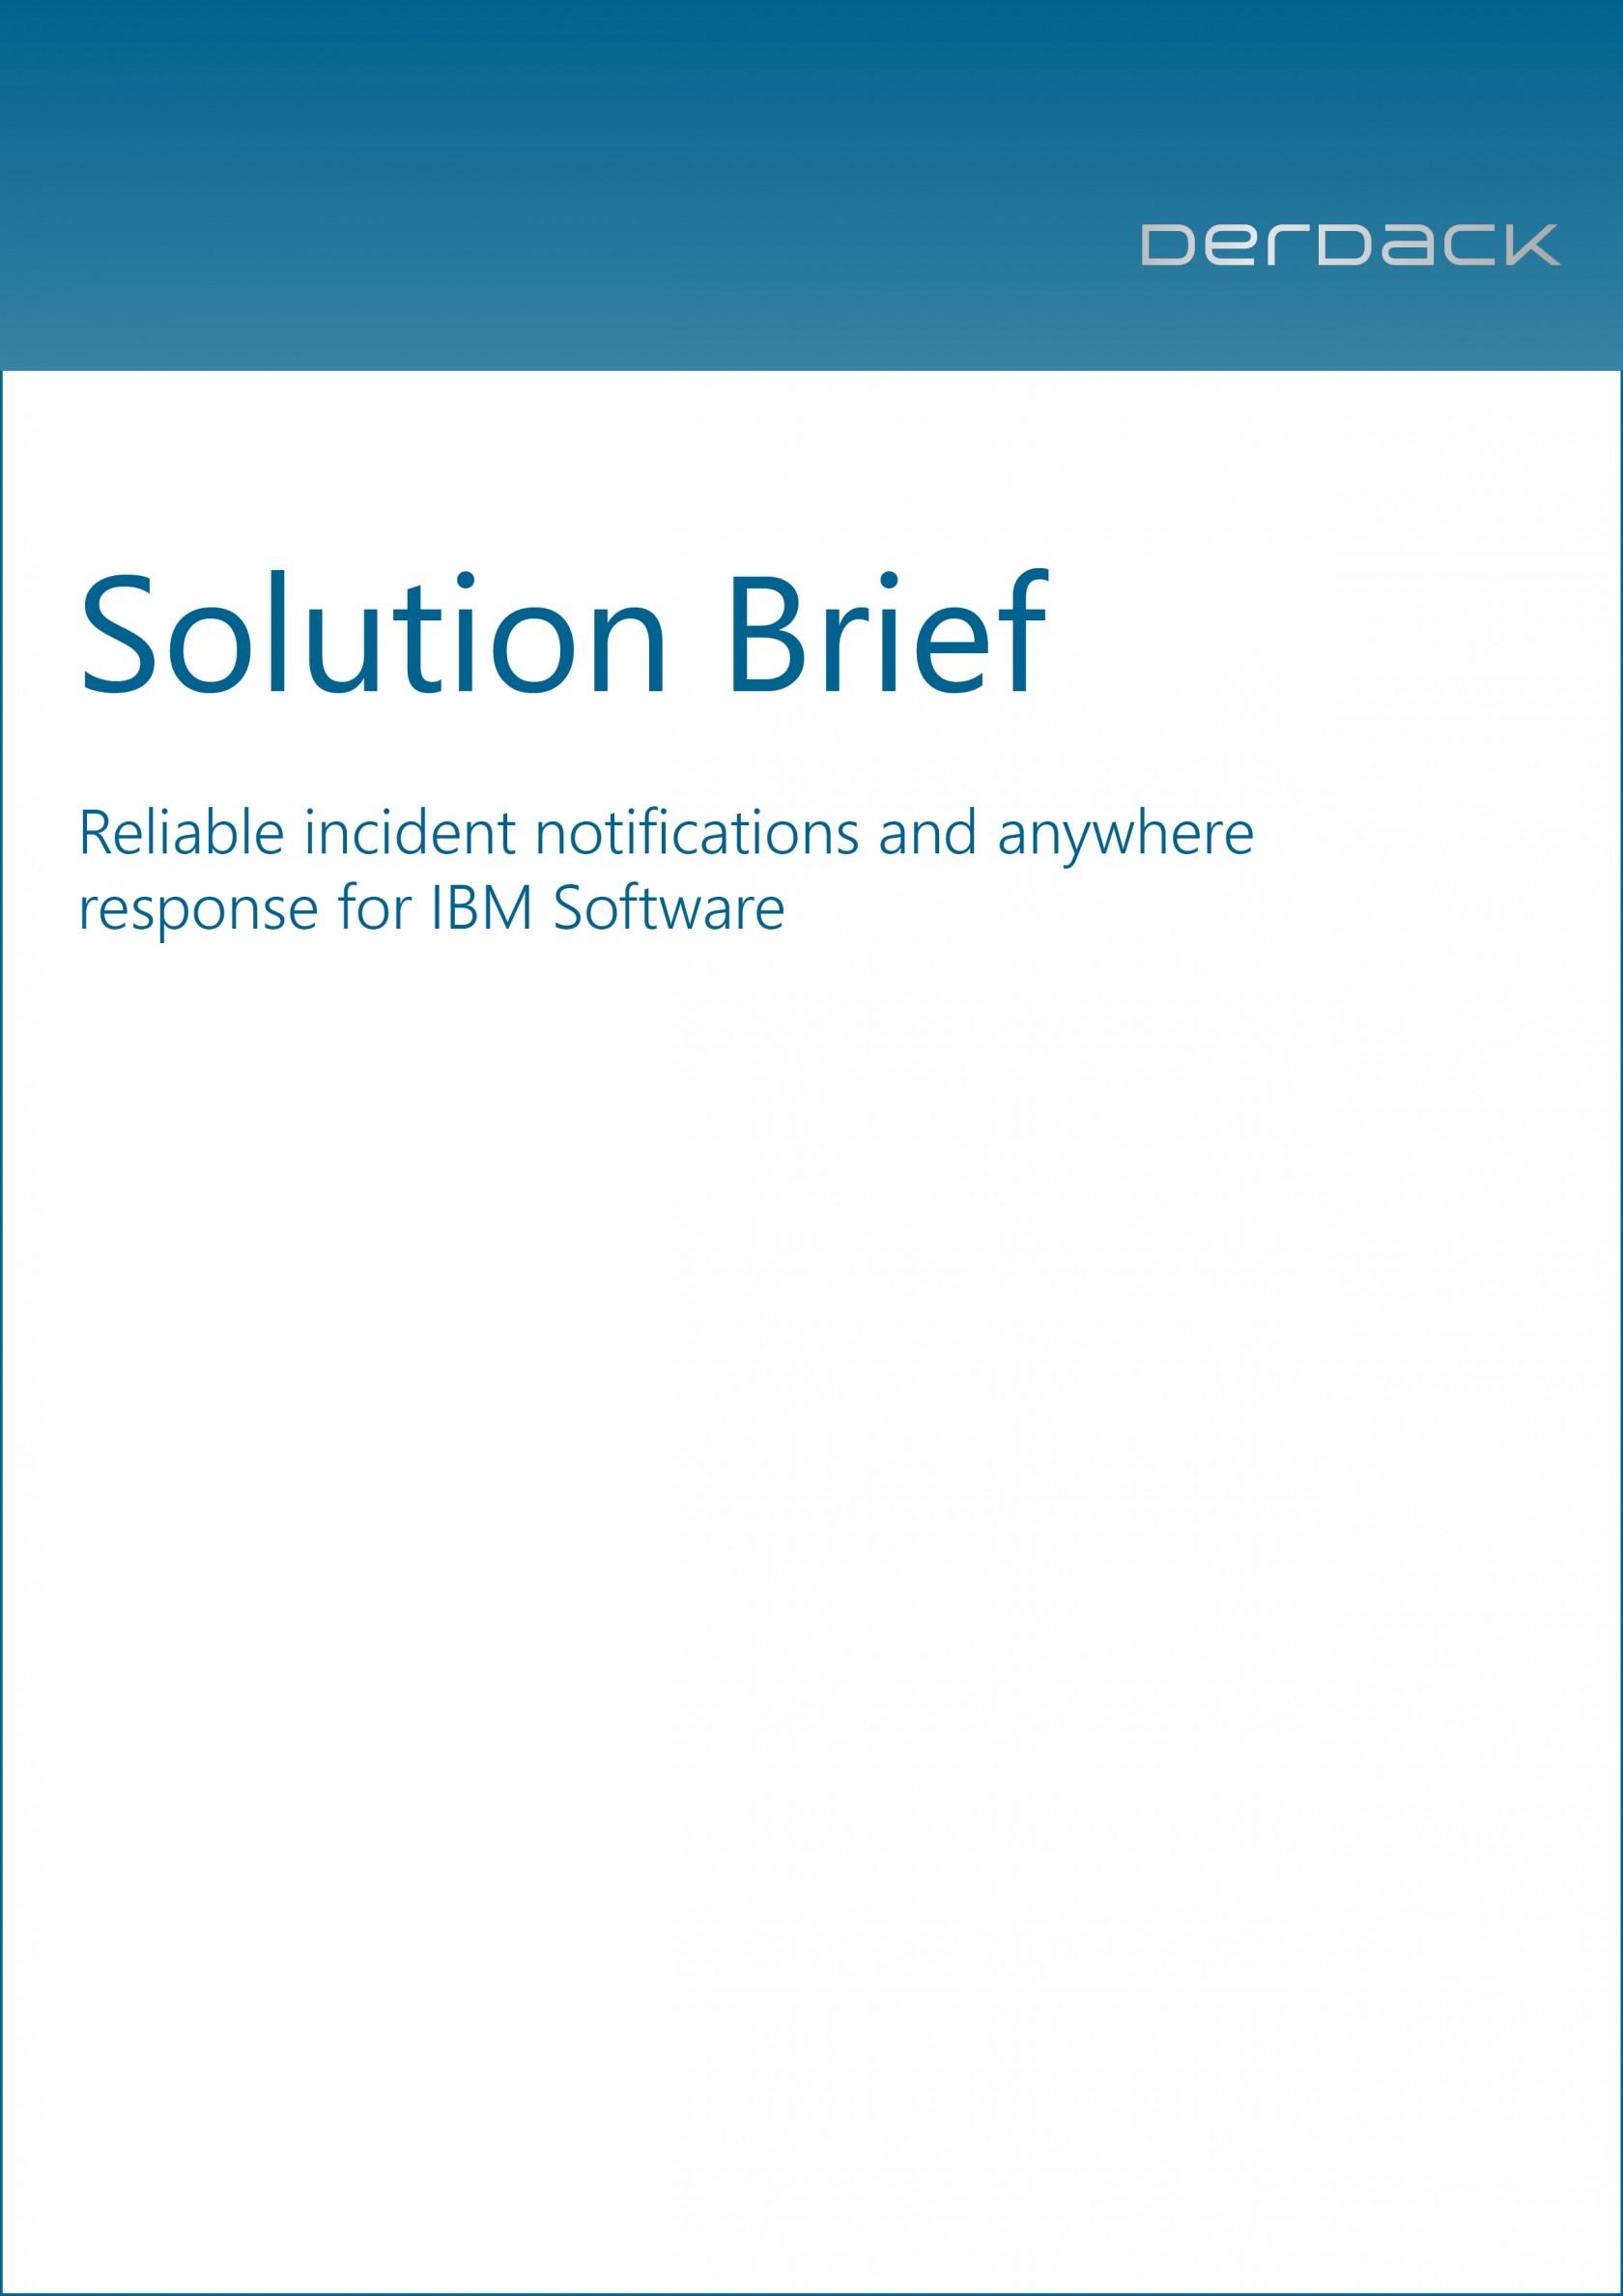 Solution Brief - IBM Tivoli Products